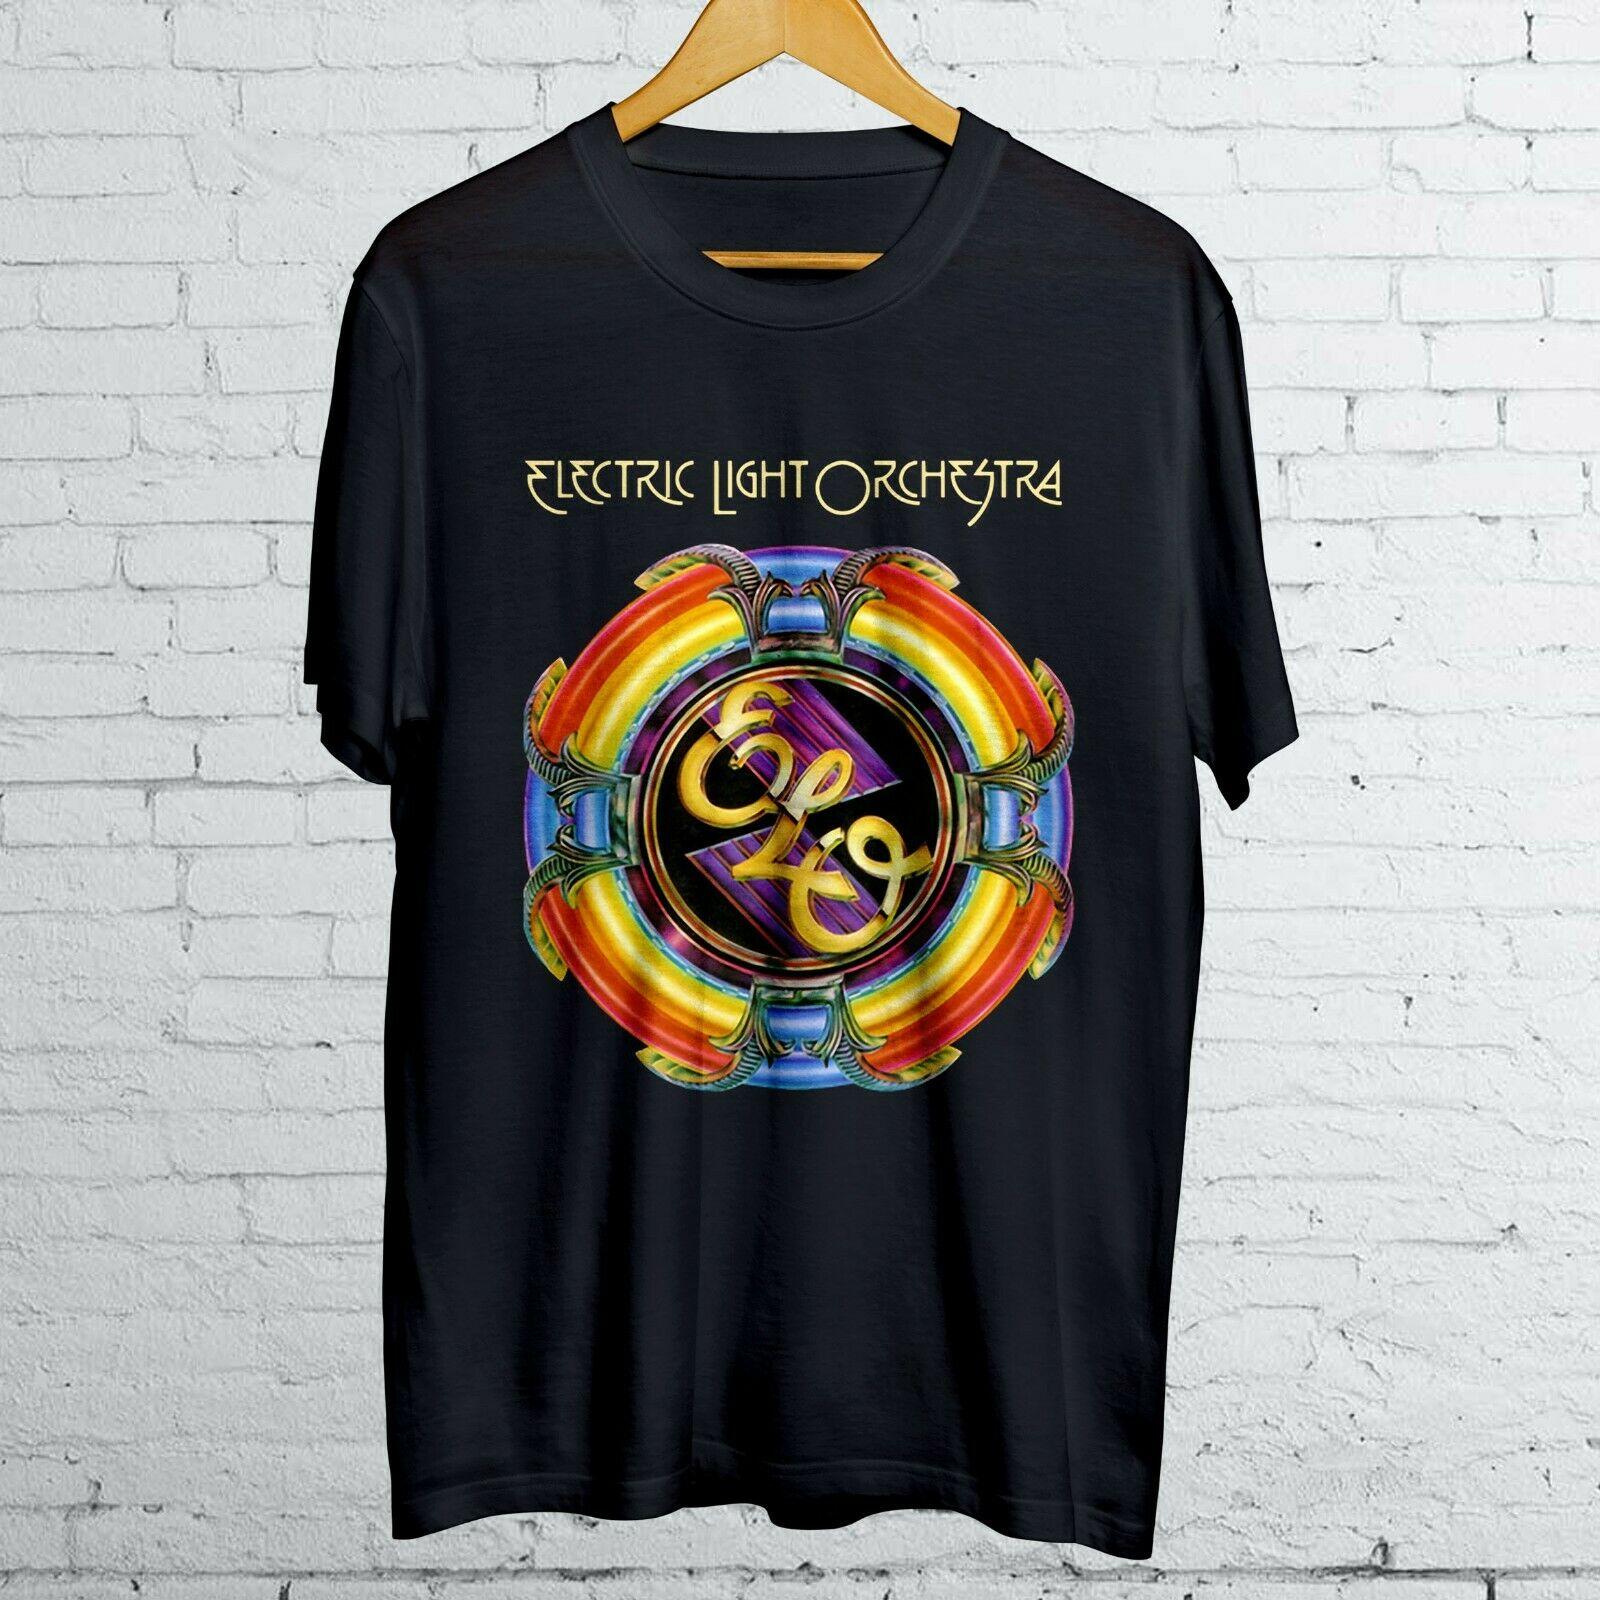 Electric Light Orchestra 50Th Anniv B Comfort camiseta S Xl calidad garantizada